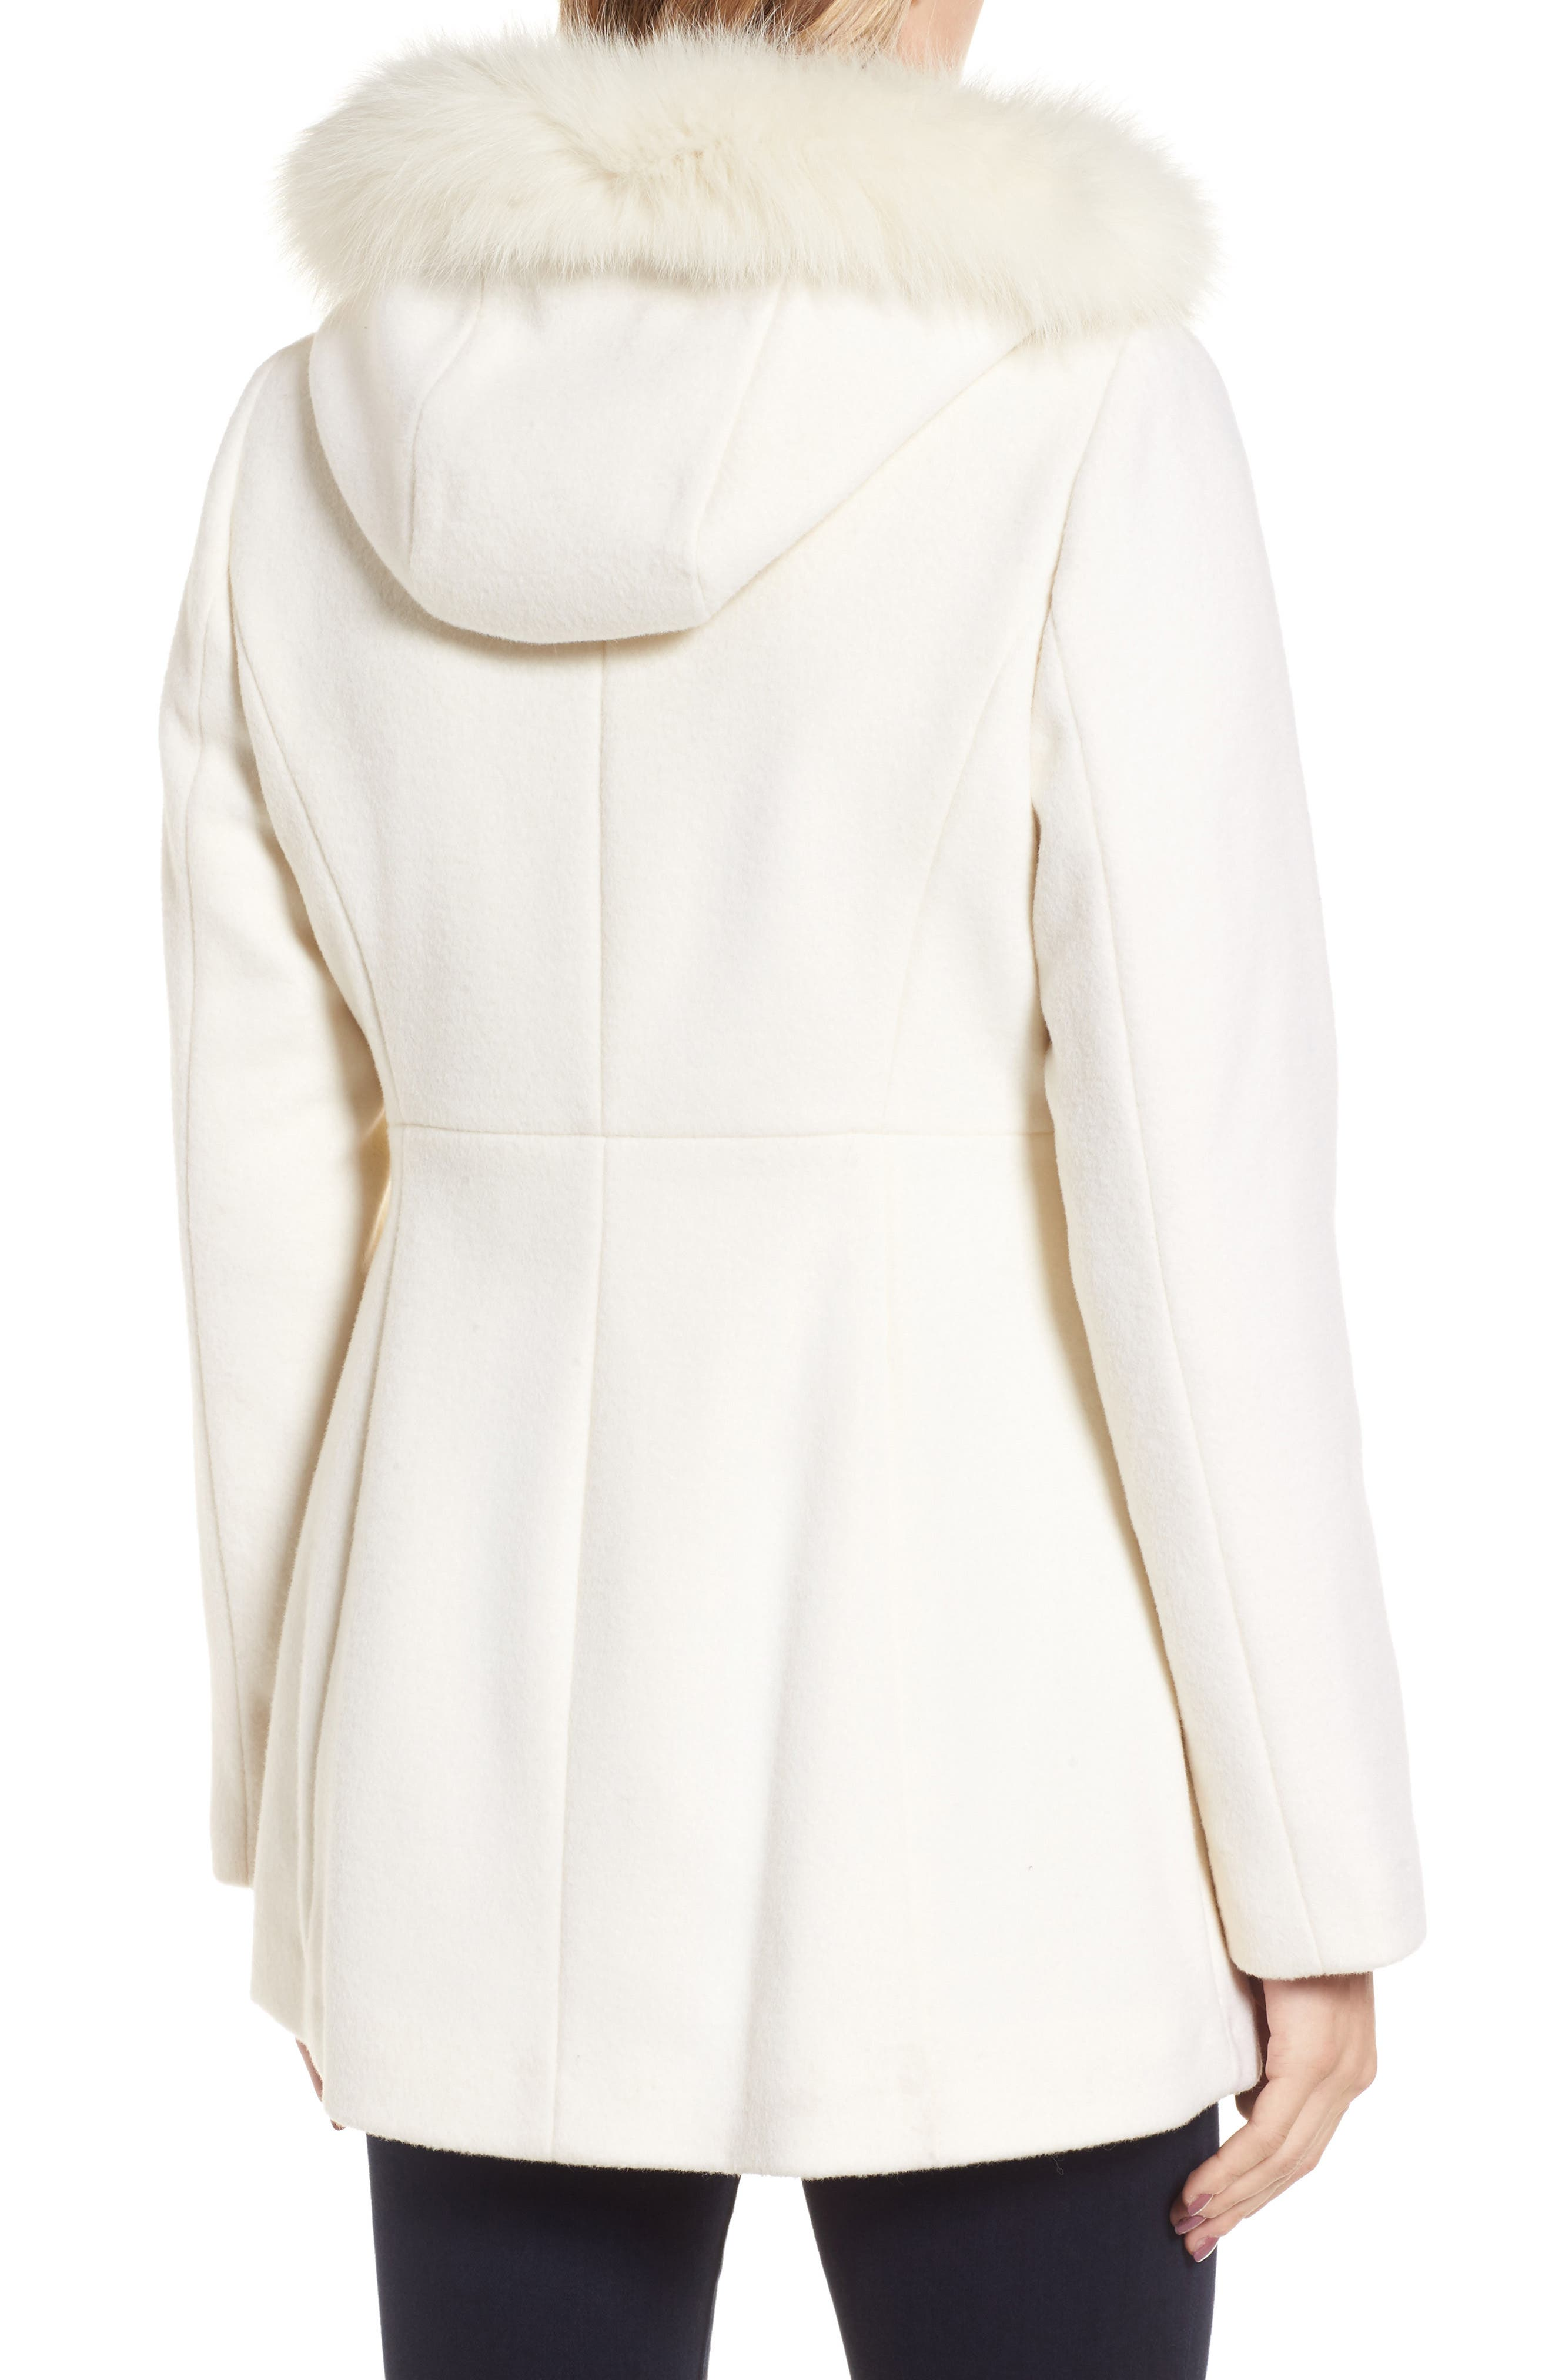 White Coat With Fur Hood Han Coats